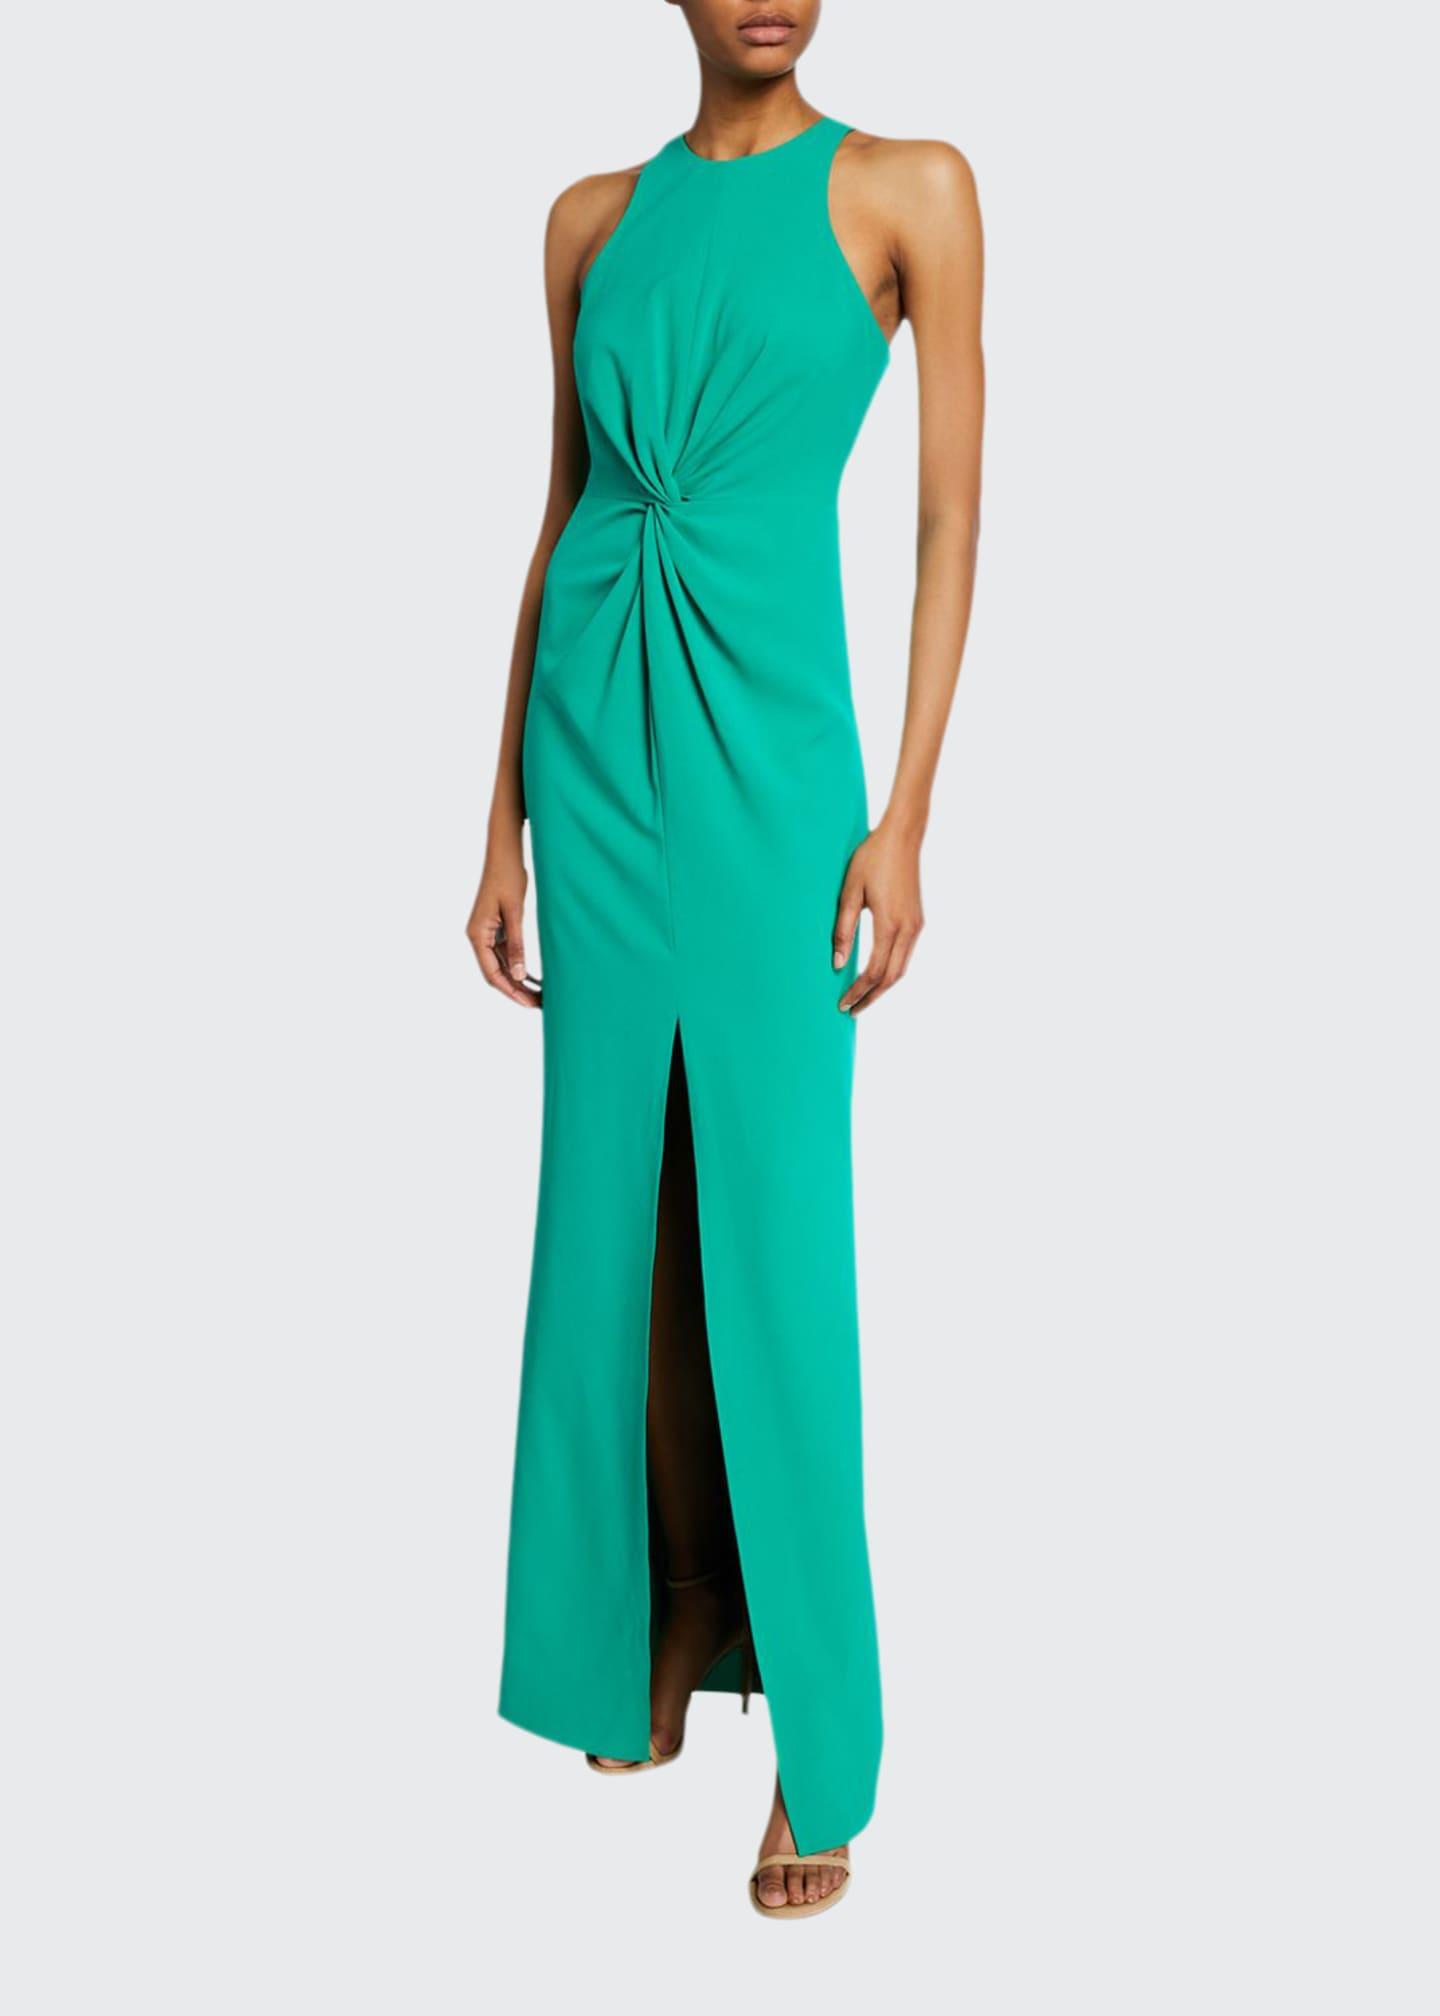 Halston Sleeveless Crepe Gown with Twist Drape Detail